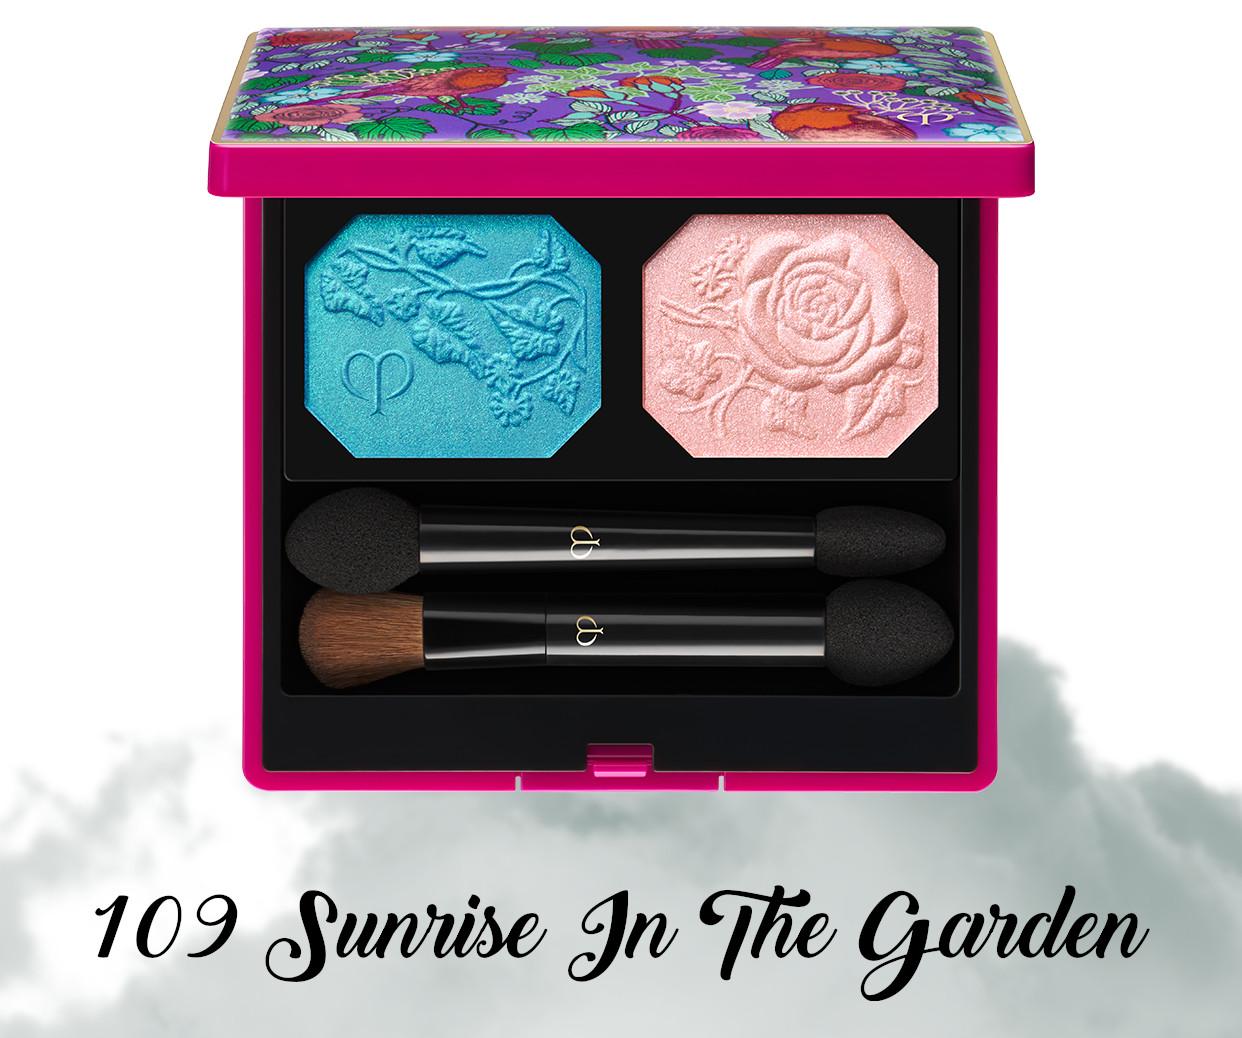 Cle de Peau Beauty Garden Of Splendor Ombres Couleurs Duo 109 Sunrise In The Garden